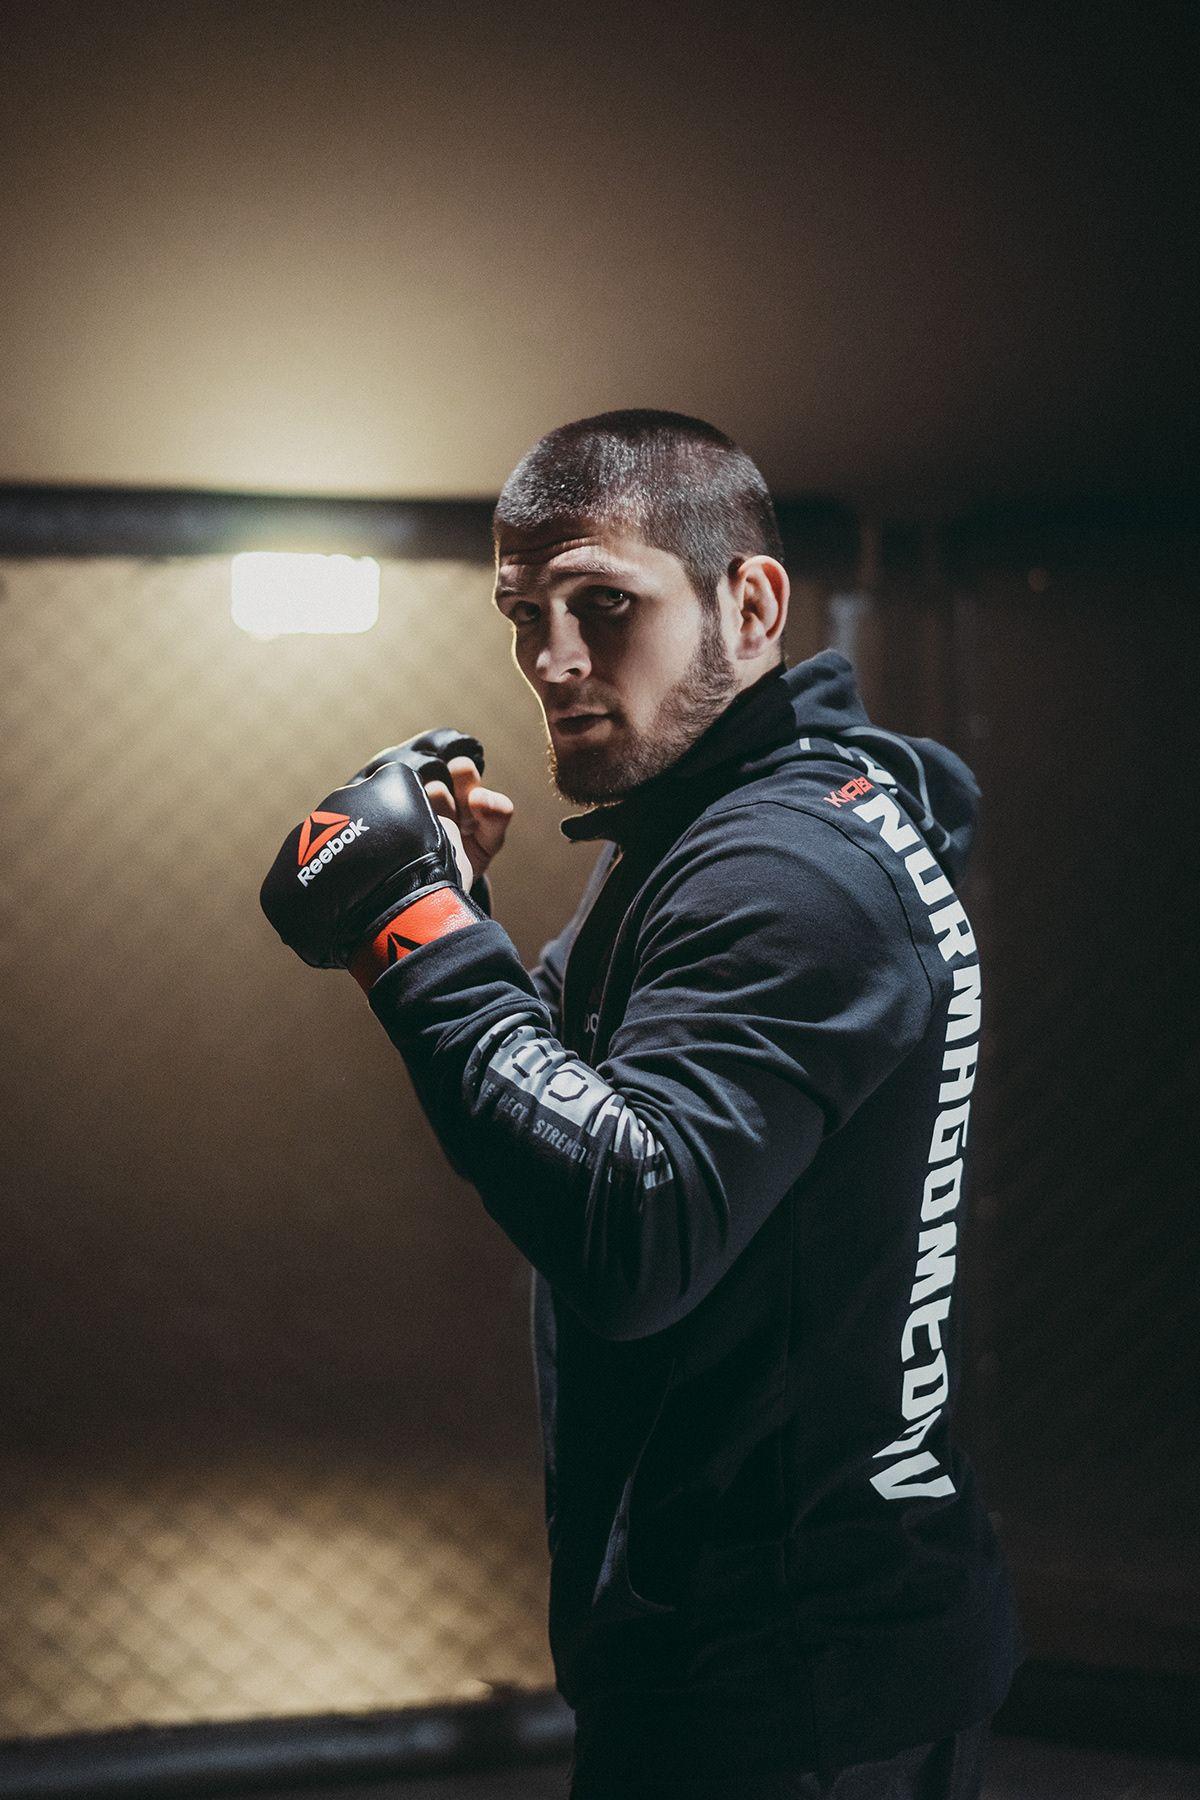 deseo Mecánica inventar  Reebok ╳ Khabib Nurmagomedov on Behance | Ufc fighters, Ufc boxing, Mma  boxing